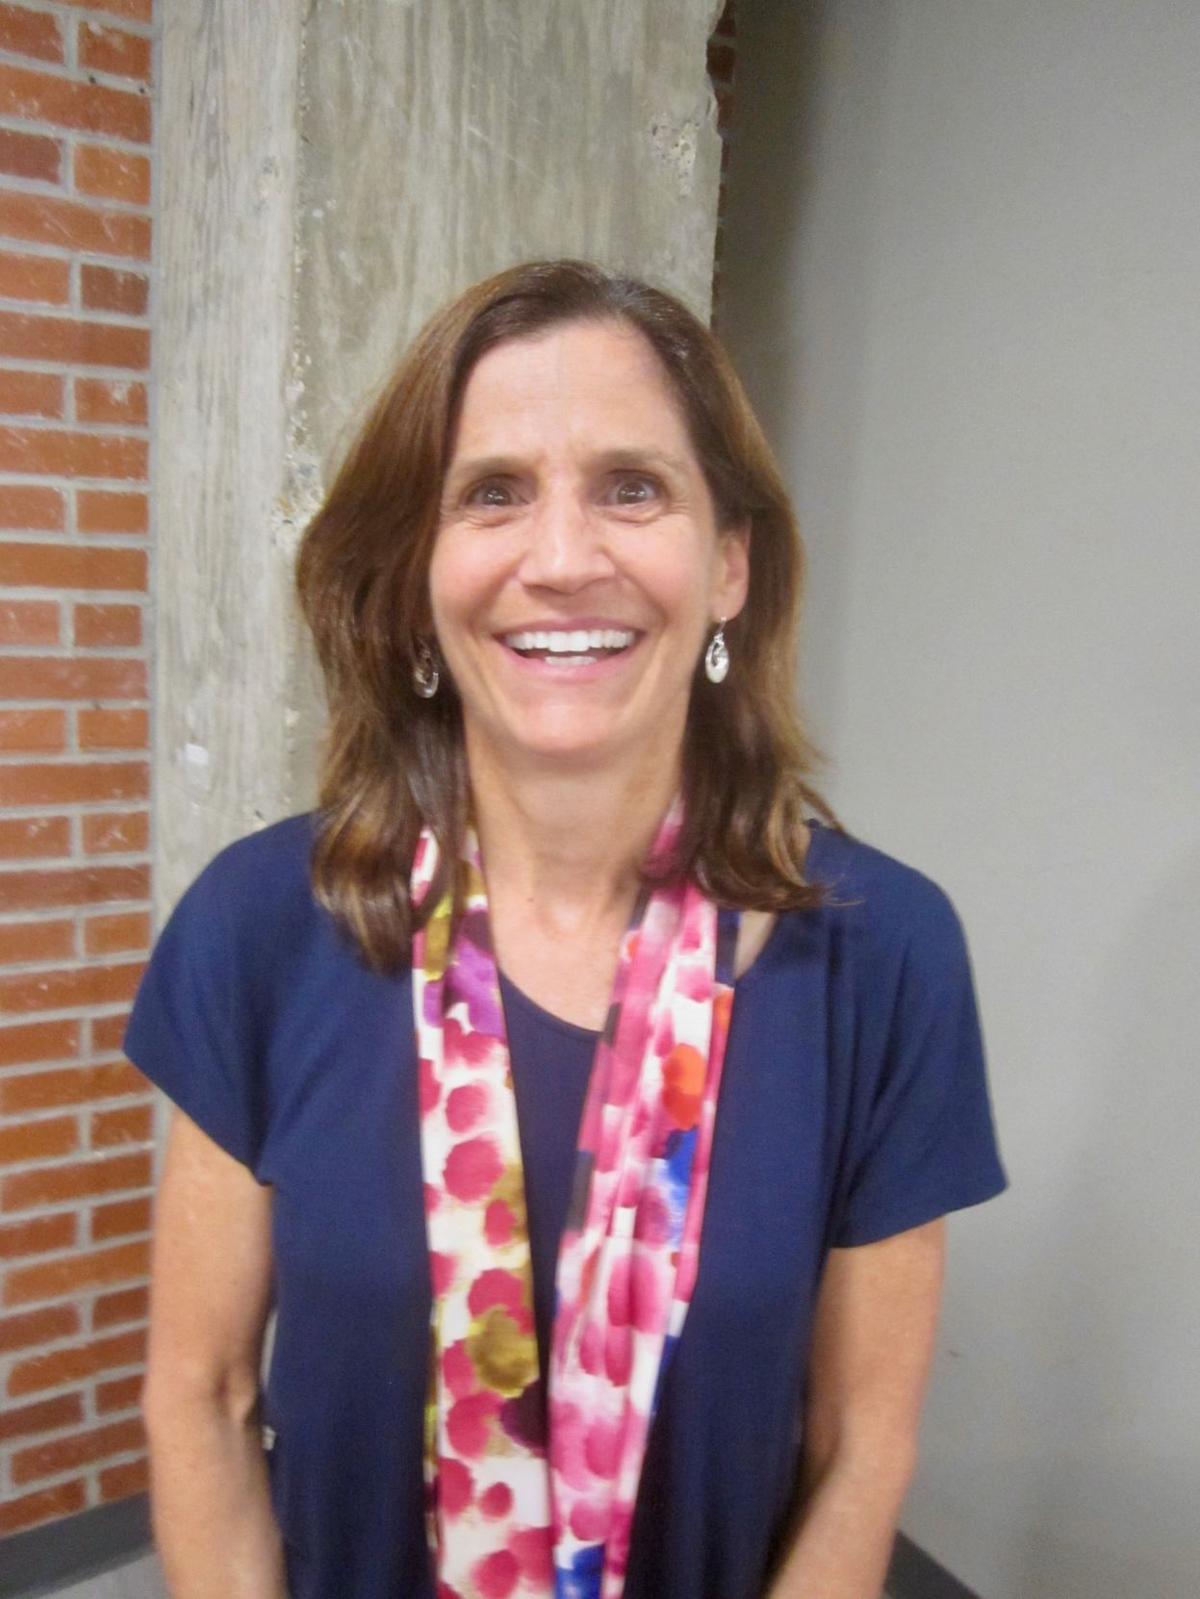 Nina Fascione